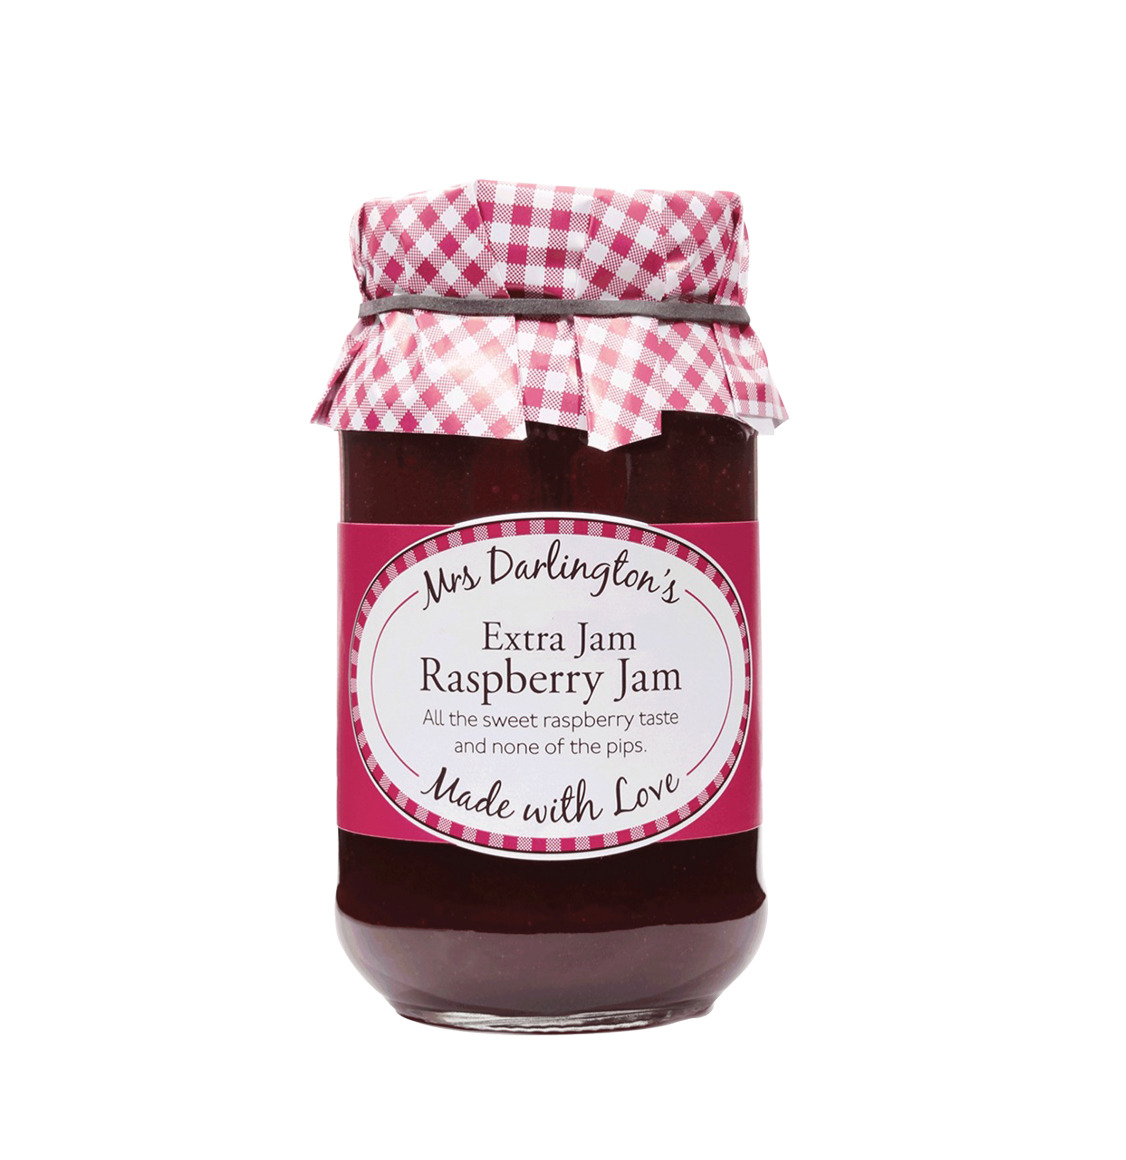 Mrs Darlington's Extra Jam Μαρμελάδα Βατόμουρου